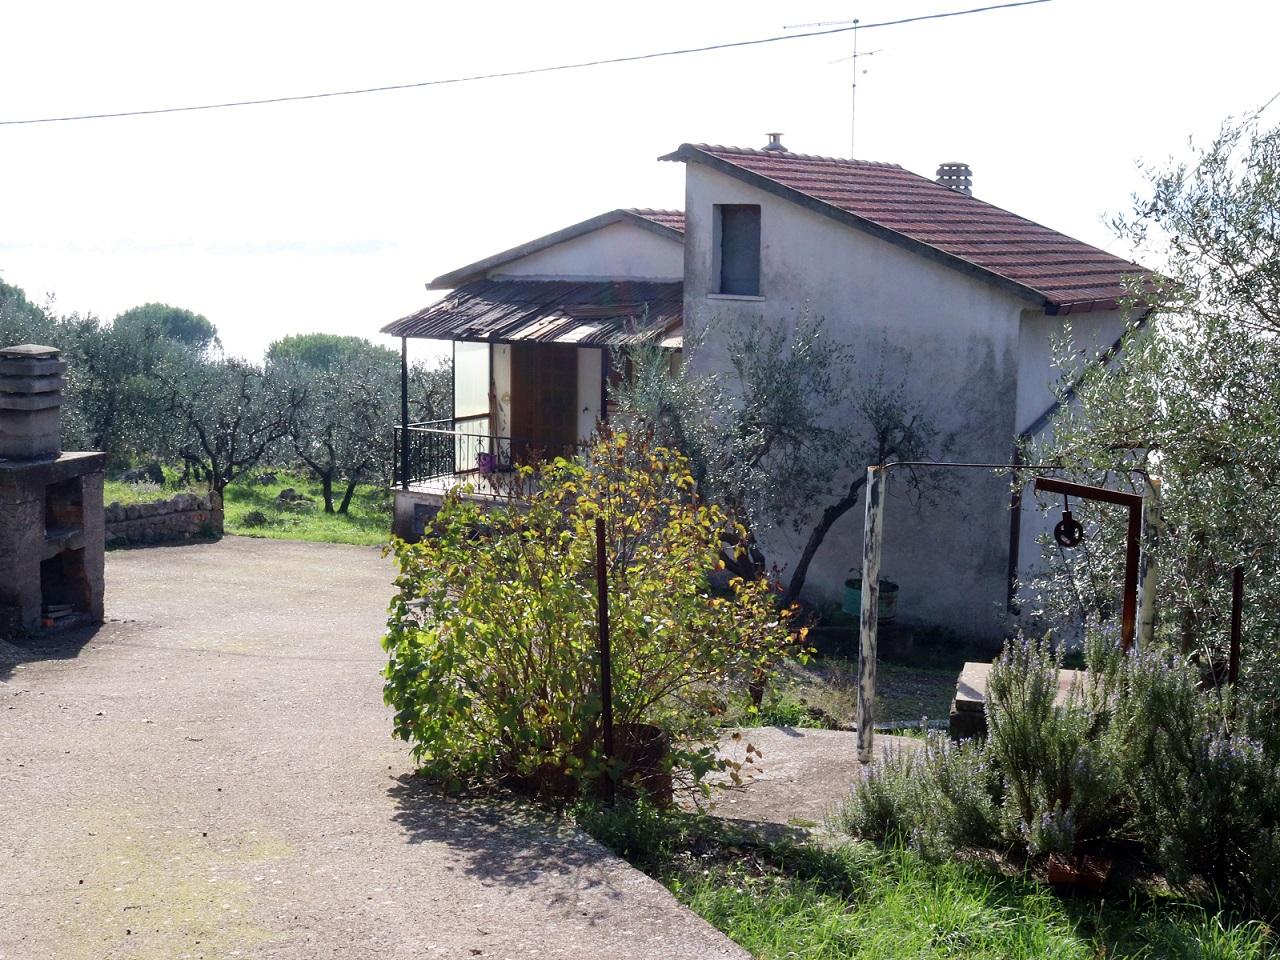 CASA SINGOLA CON GIARDINO -Rif.23alv